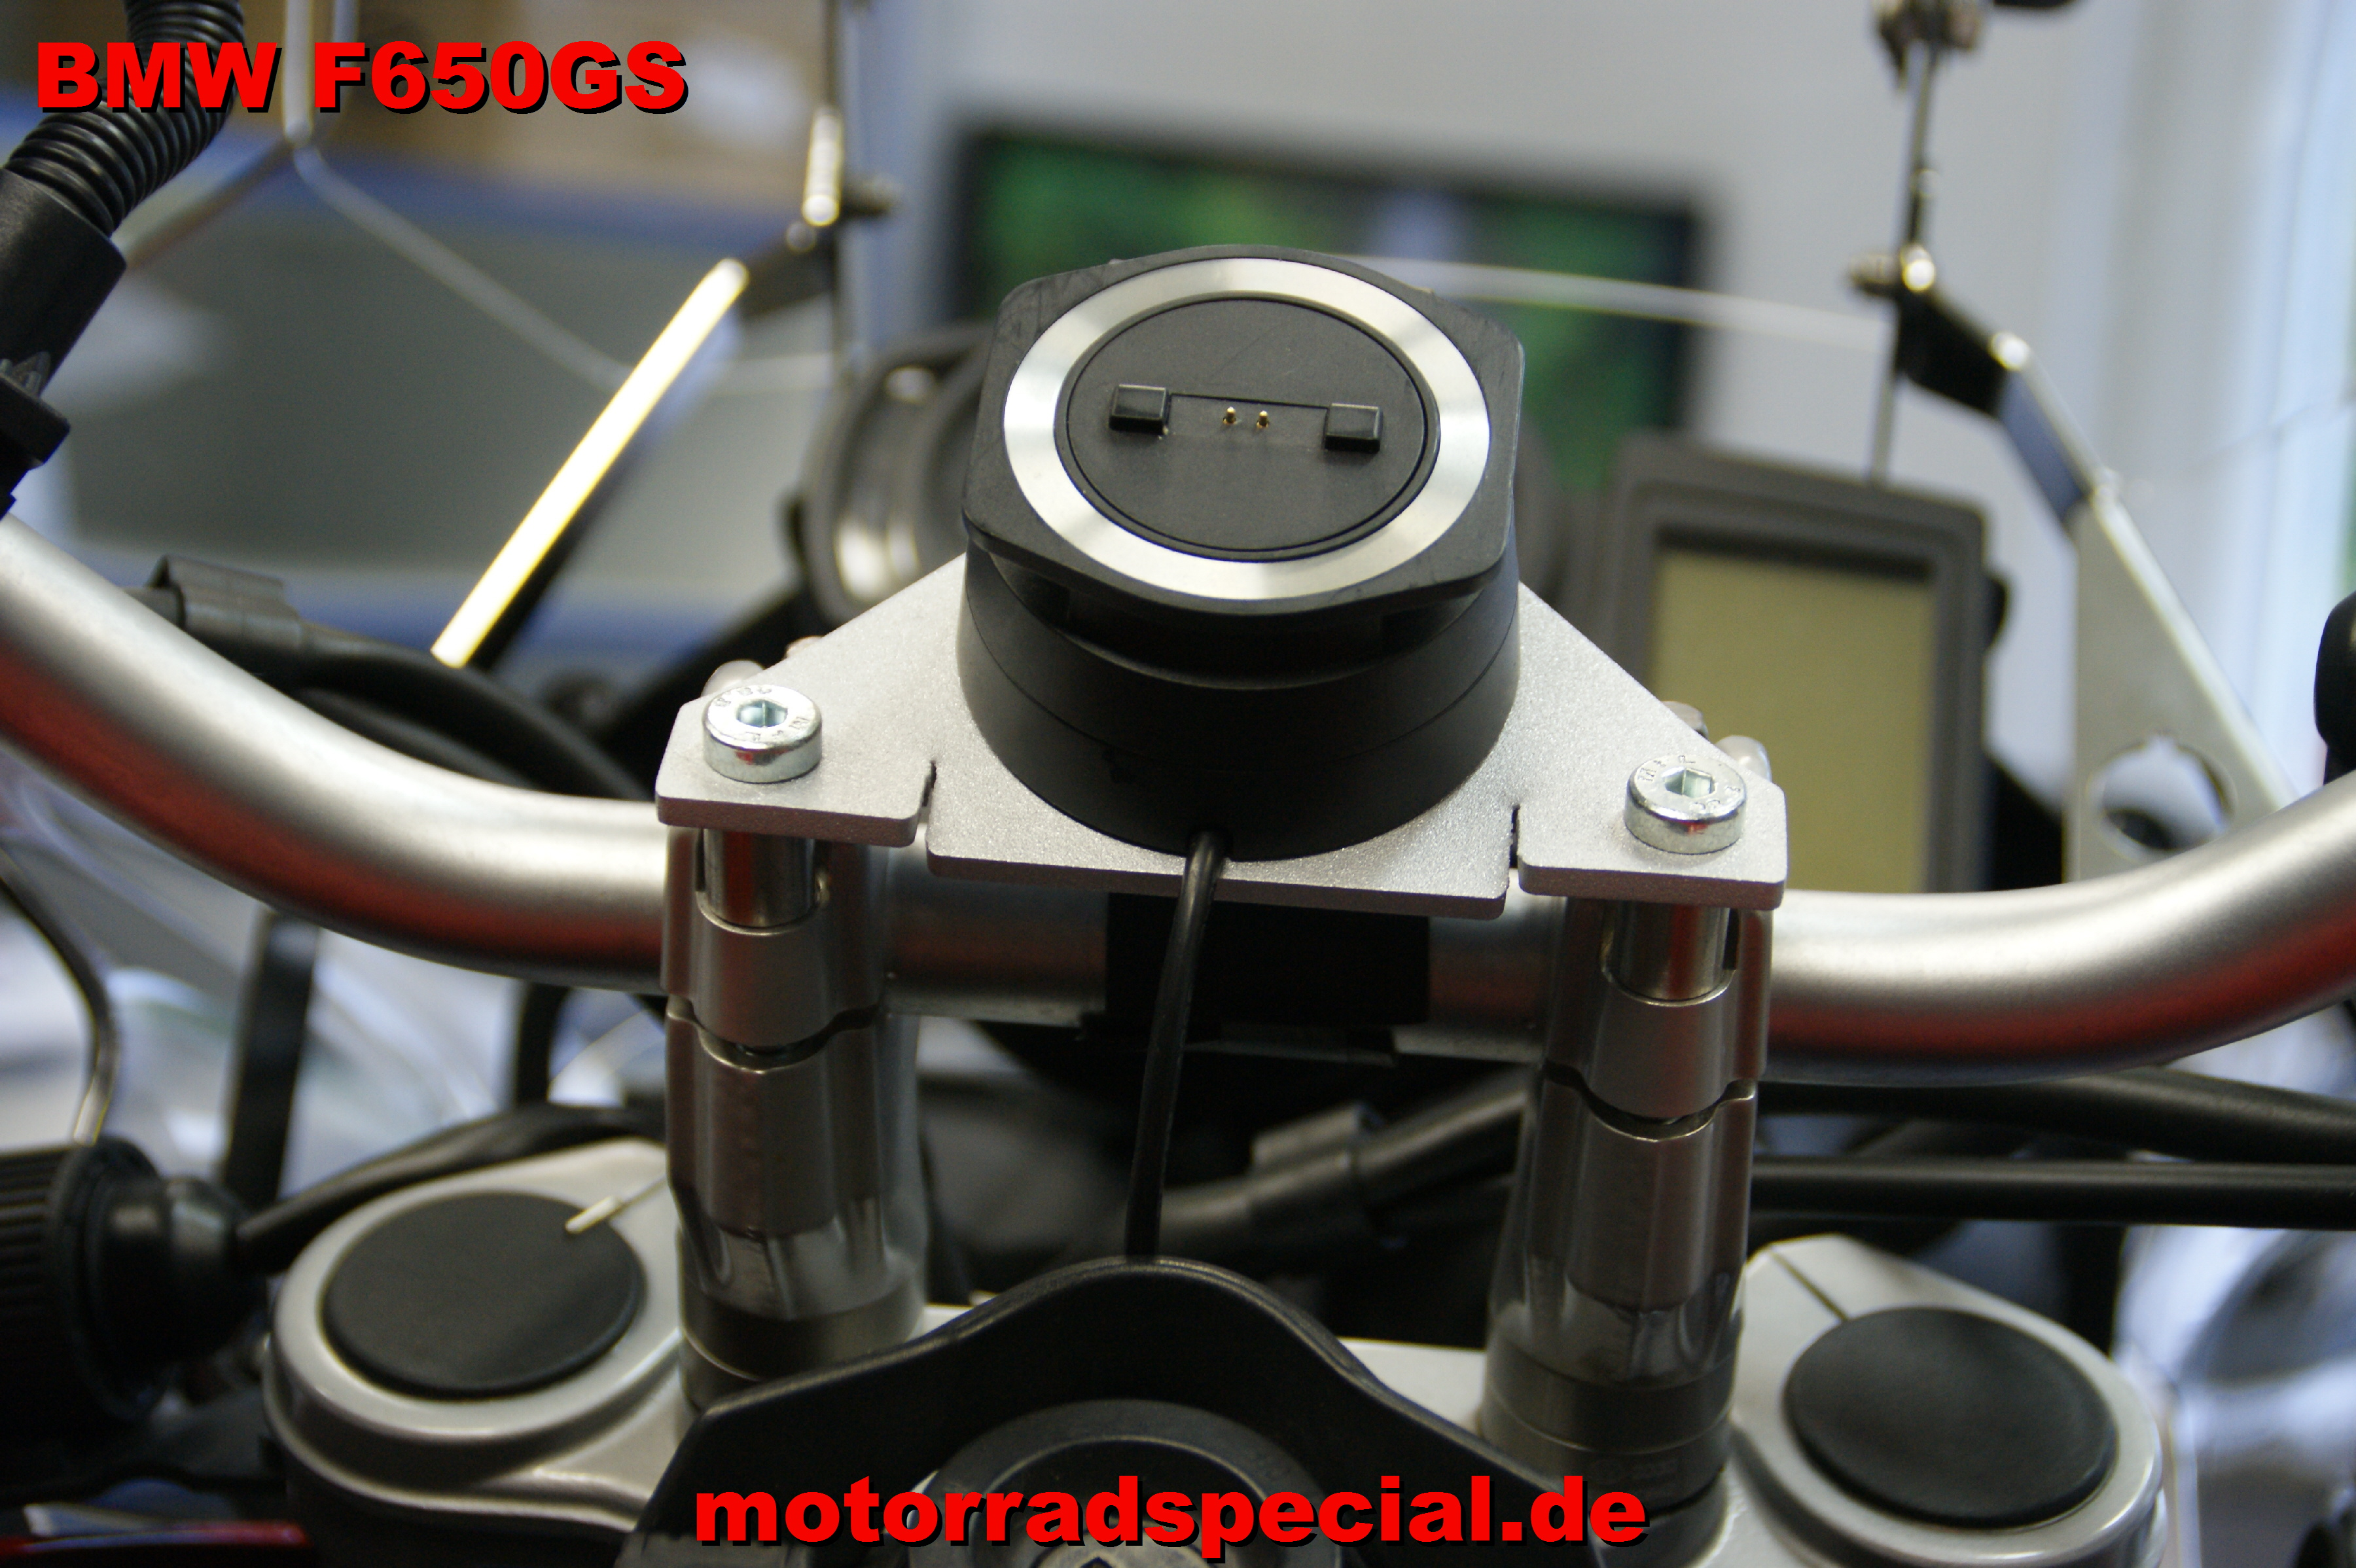 BMW_F650GS_Navigationshalterung_Navihalter_TomTom Rider_400_410_2